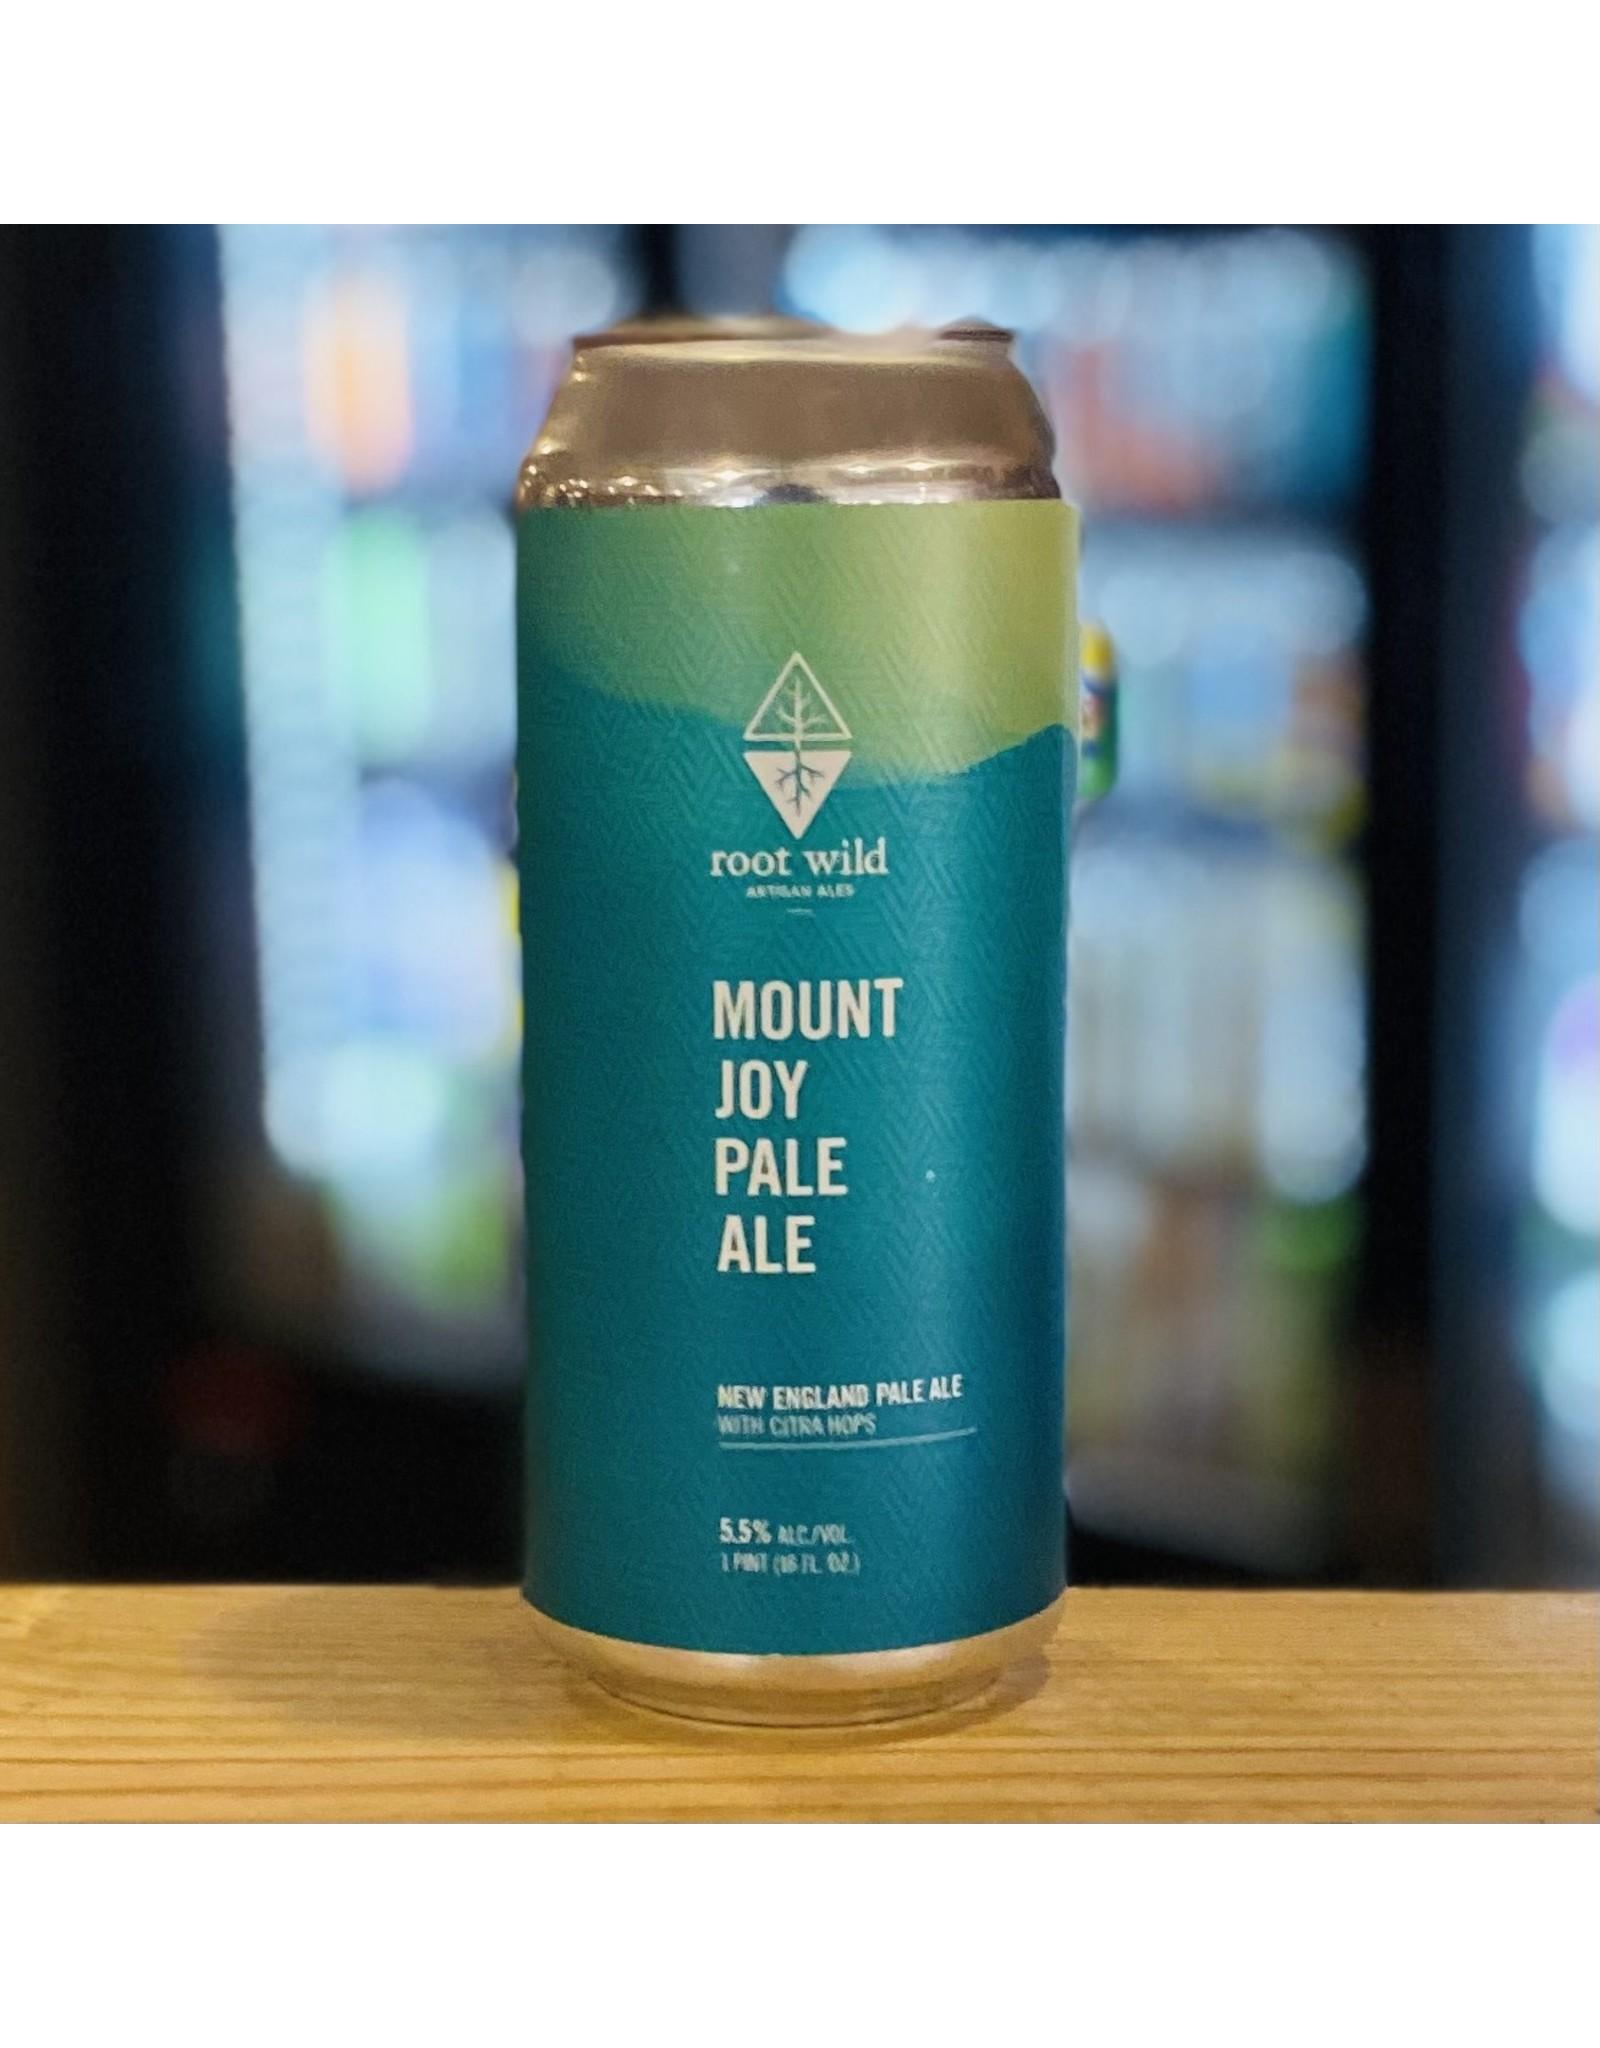 "Pale Ale Root Wild Artisan Ales ""Mount Joy"" New England Pale Ale - Portland, Maine"